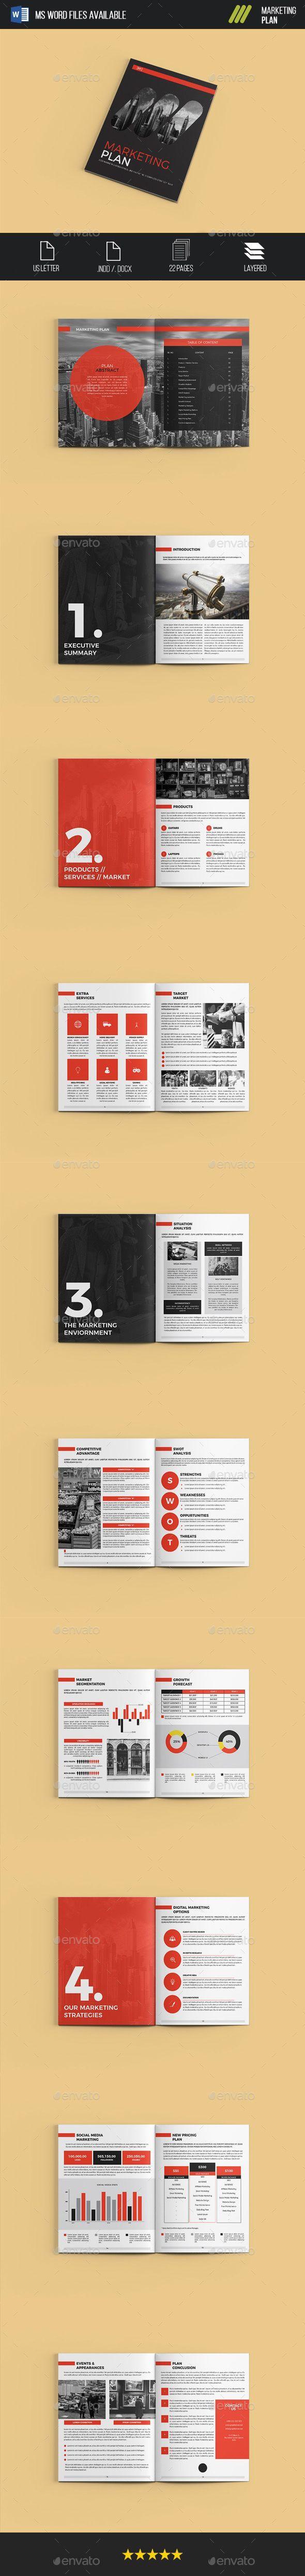 Marketing Plan Brochure Template InDesign INDD